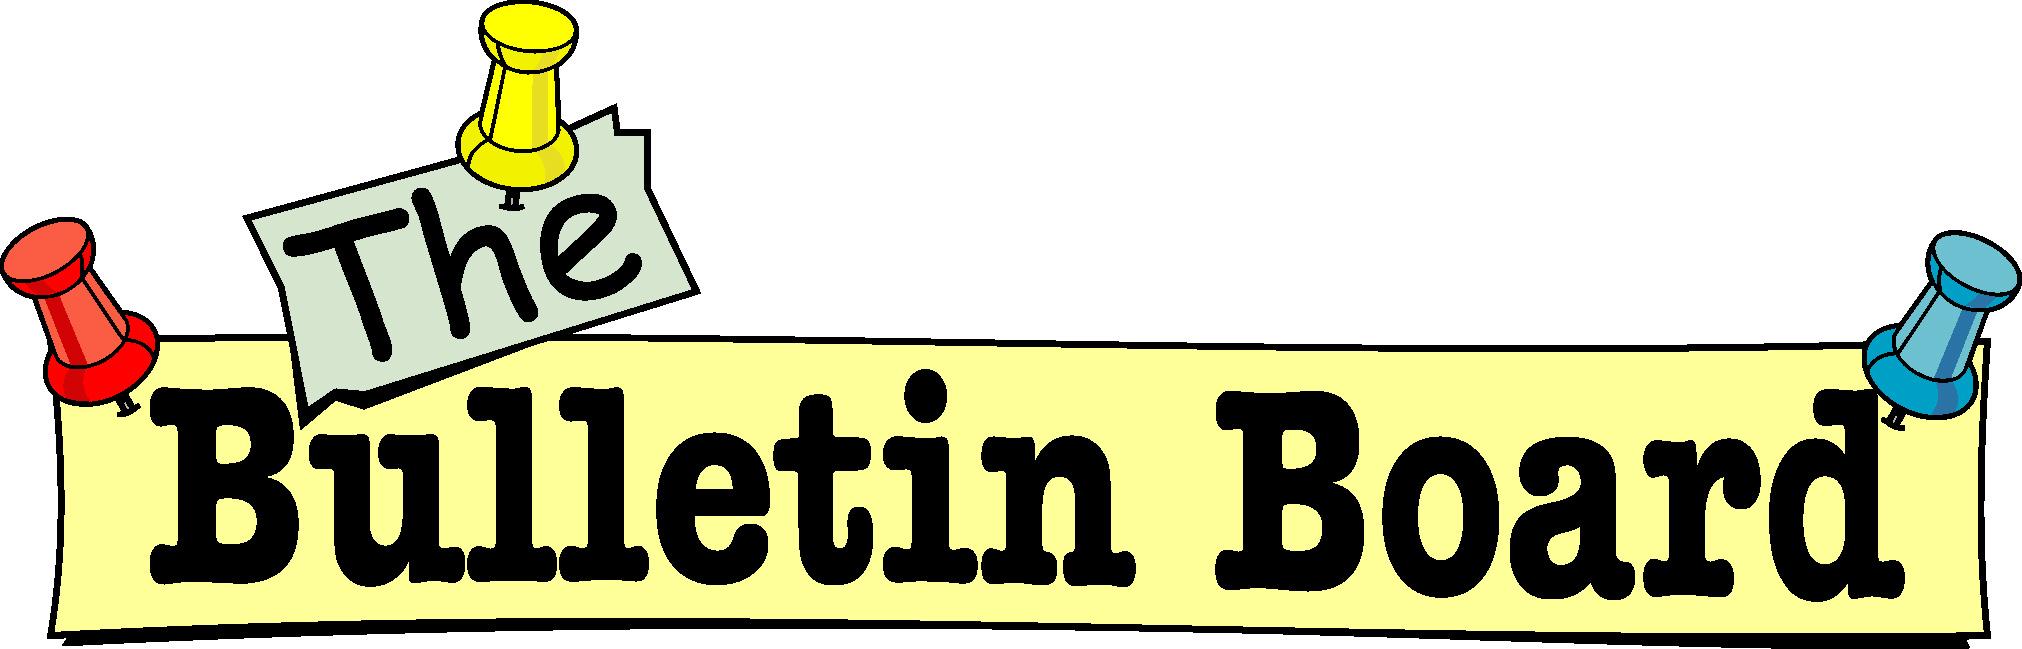 news bulletin clipart - Bulletin Board Clipart